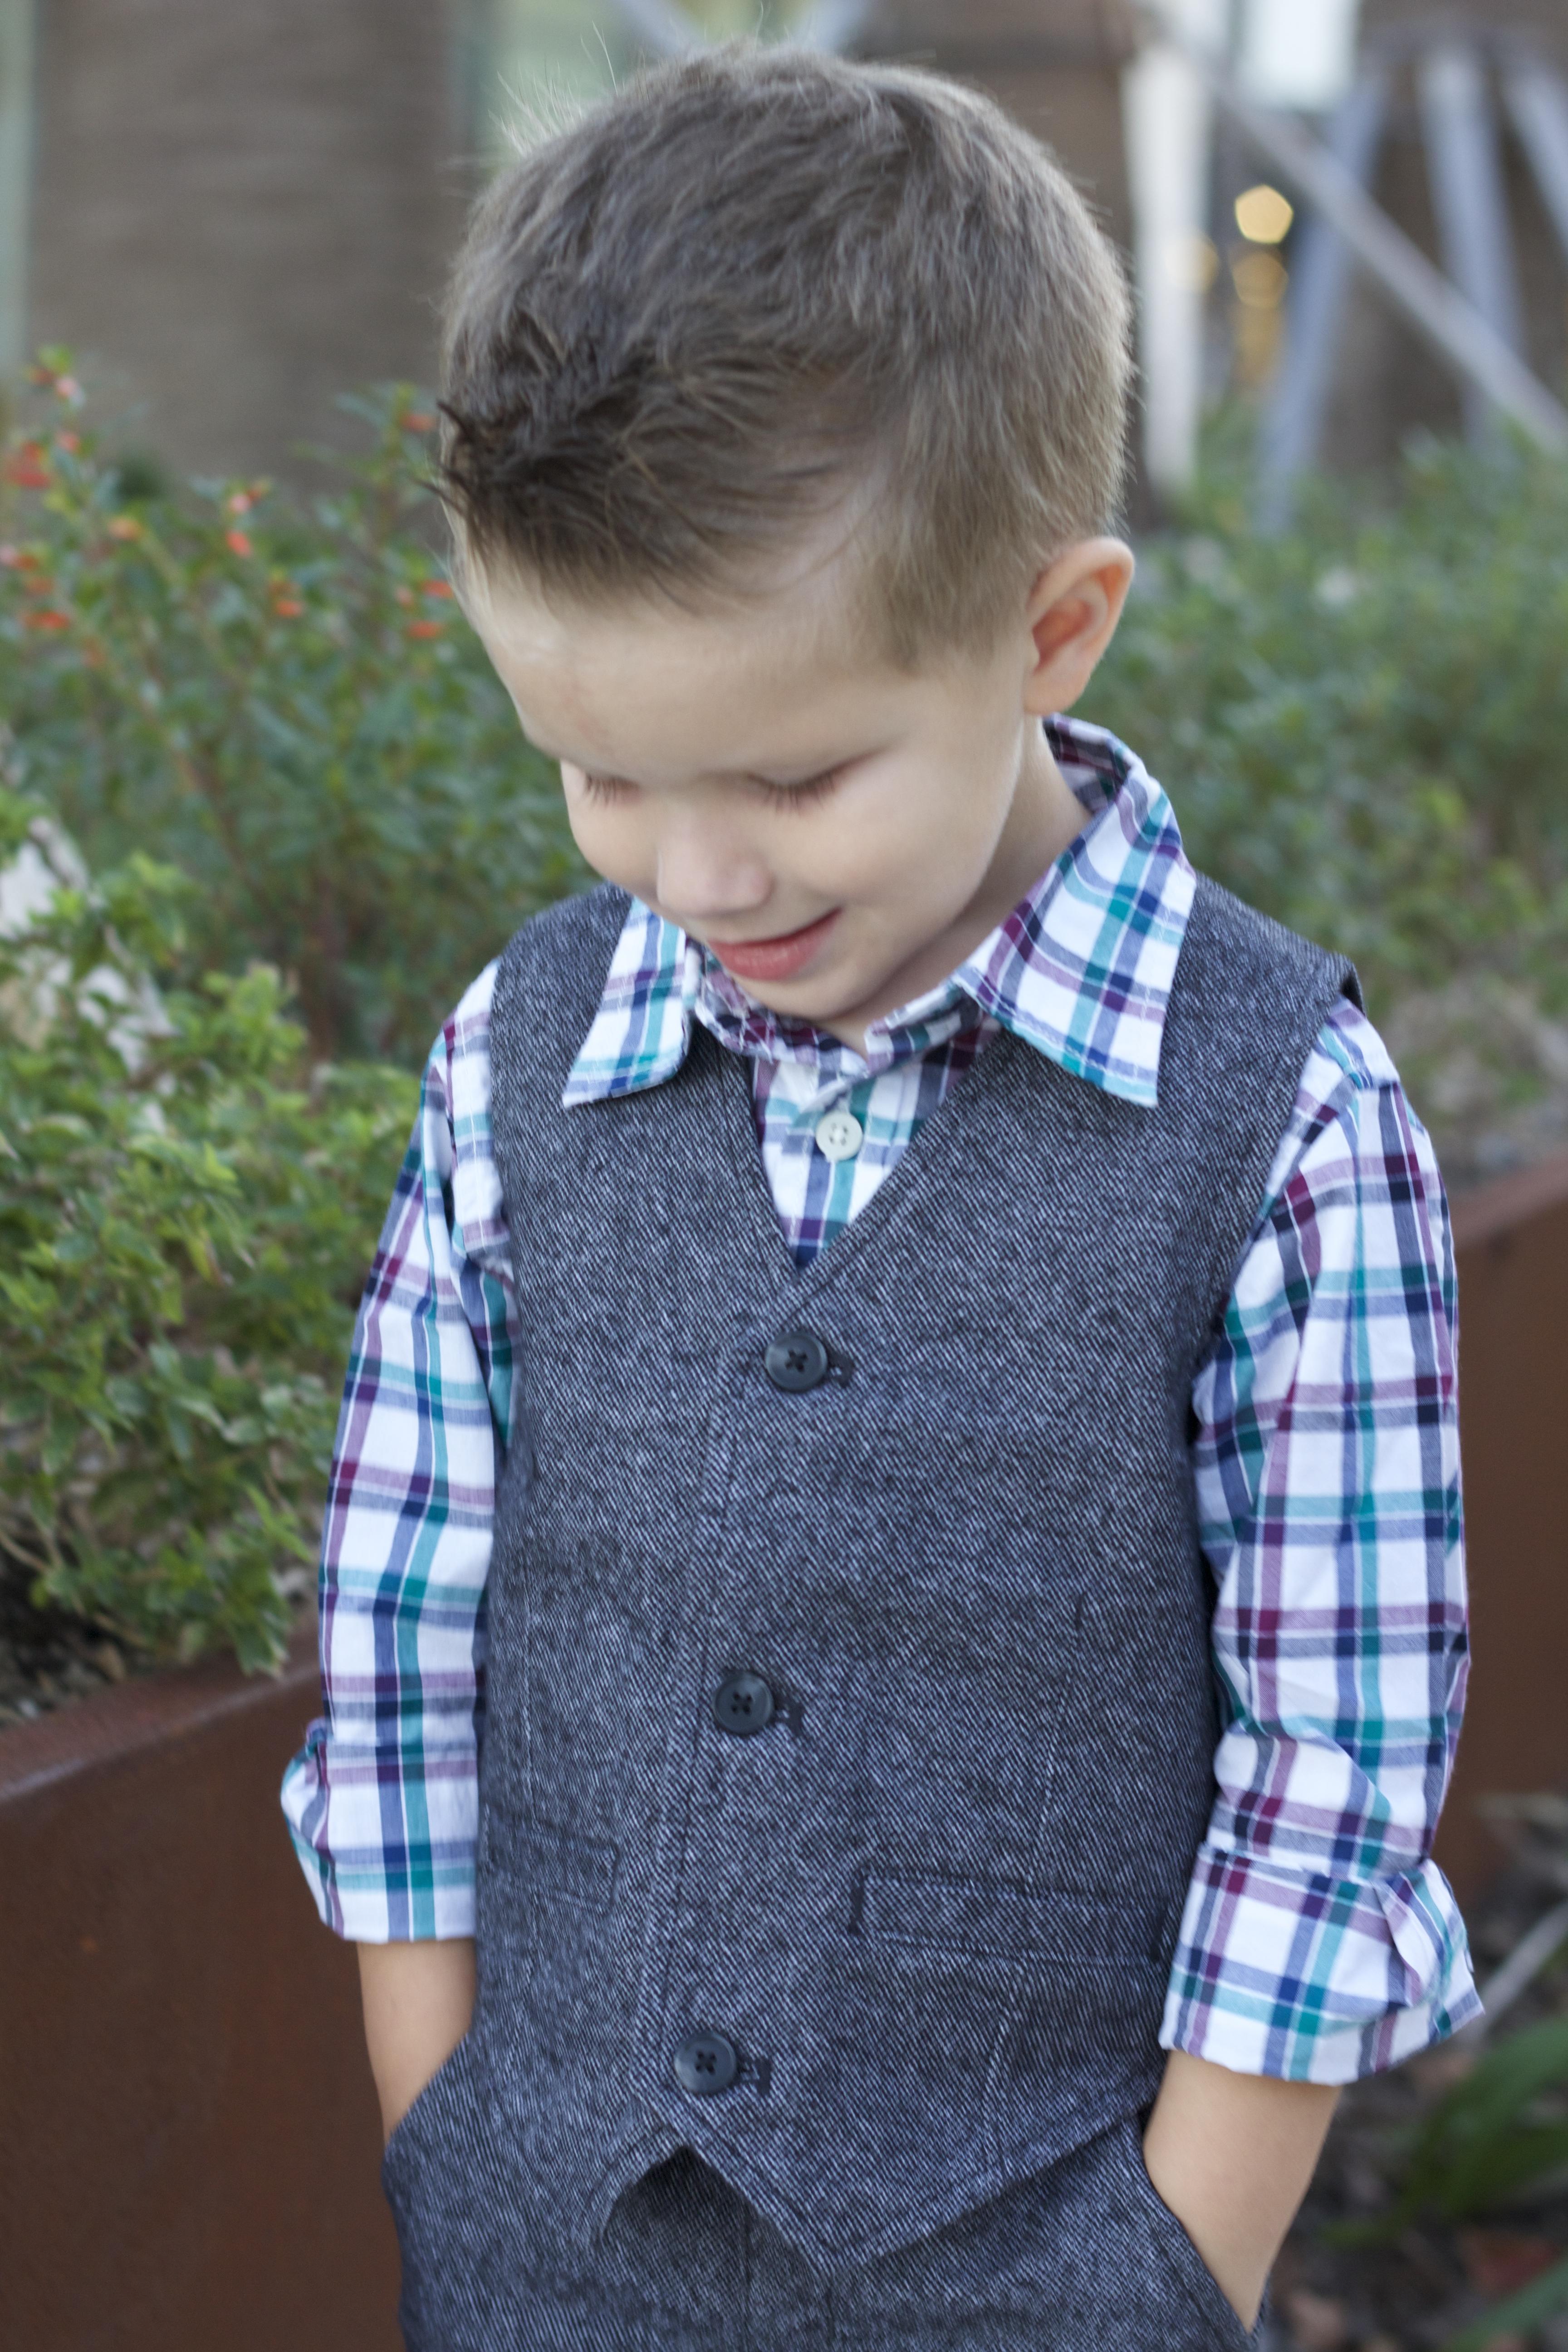 Kids Fashion: Dressy Winter Emerald Tones